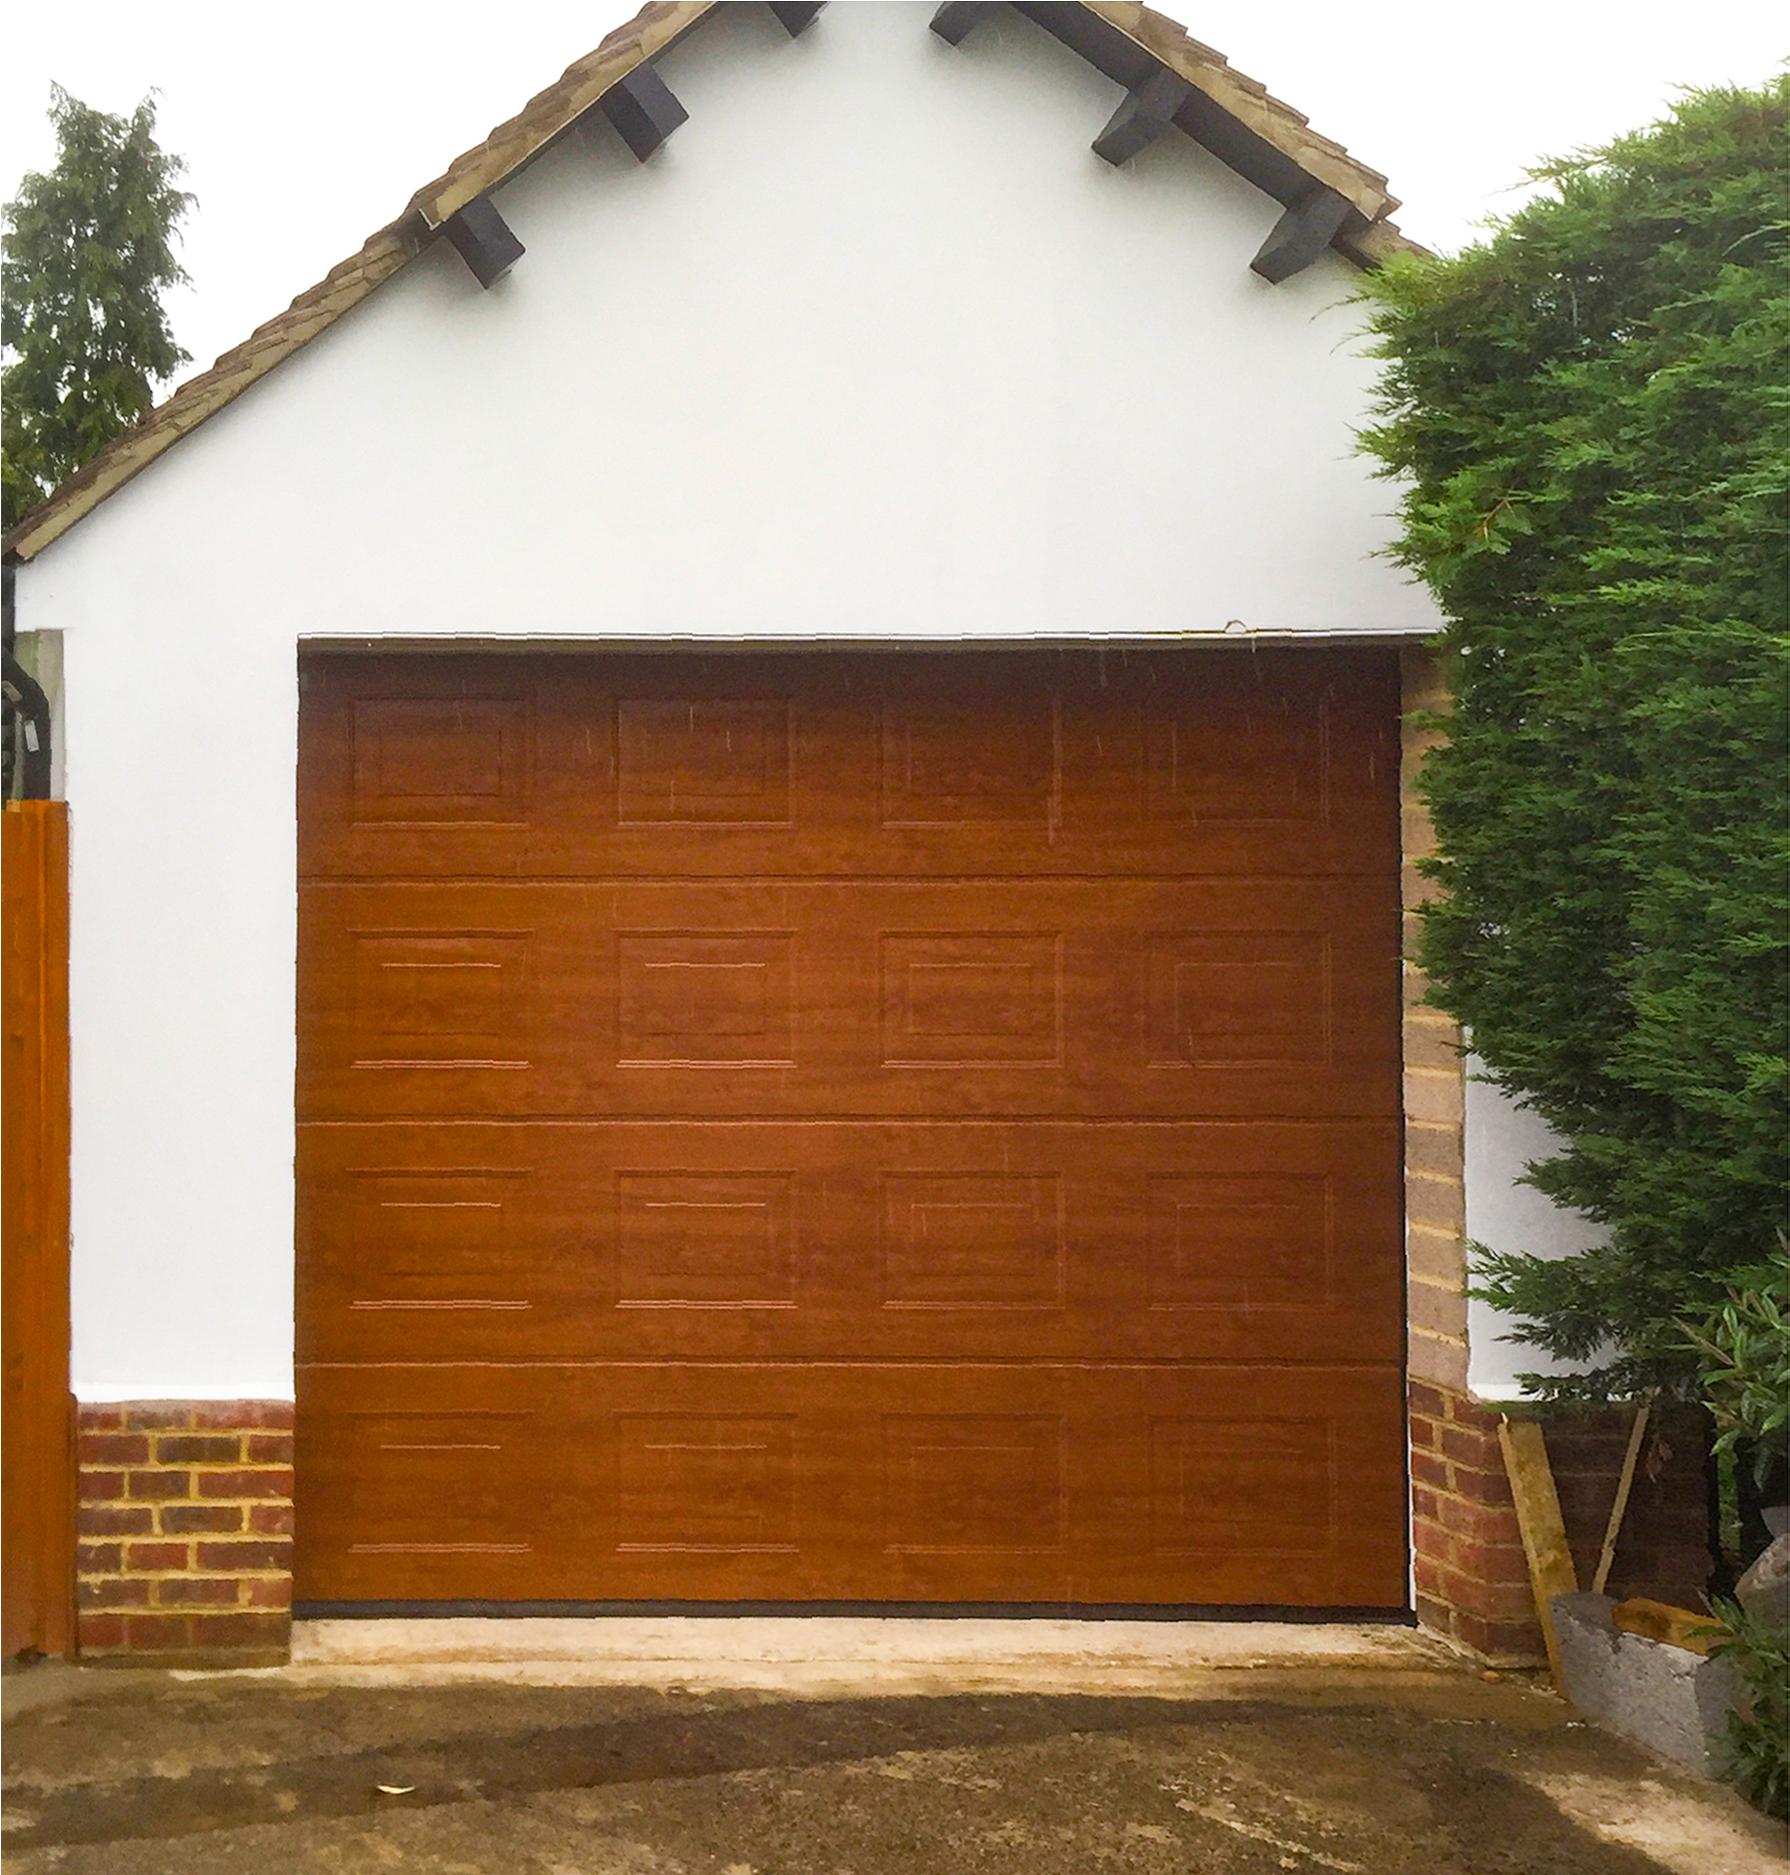 Hormann LPU 42 Panelled Insulated Sectional Garage Door Finished in Decograin Golden Oak